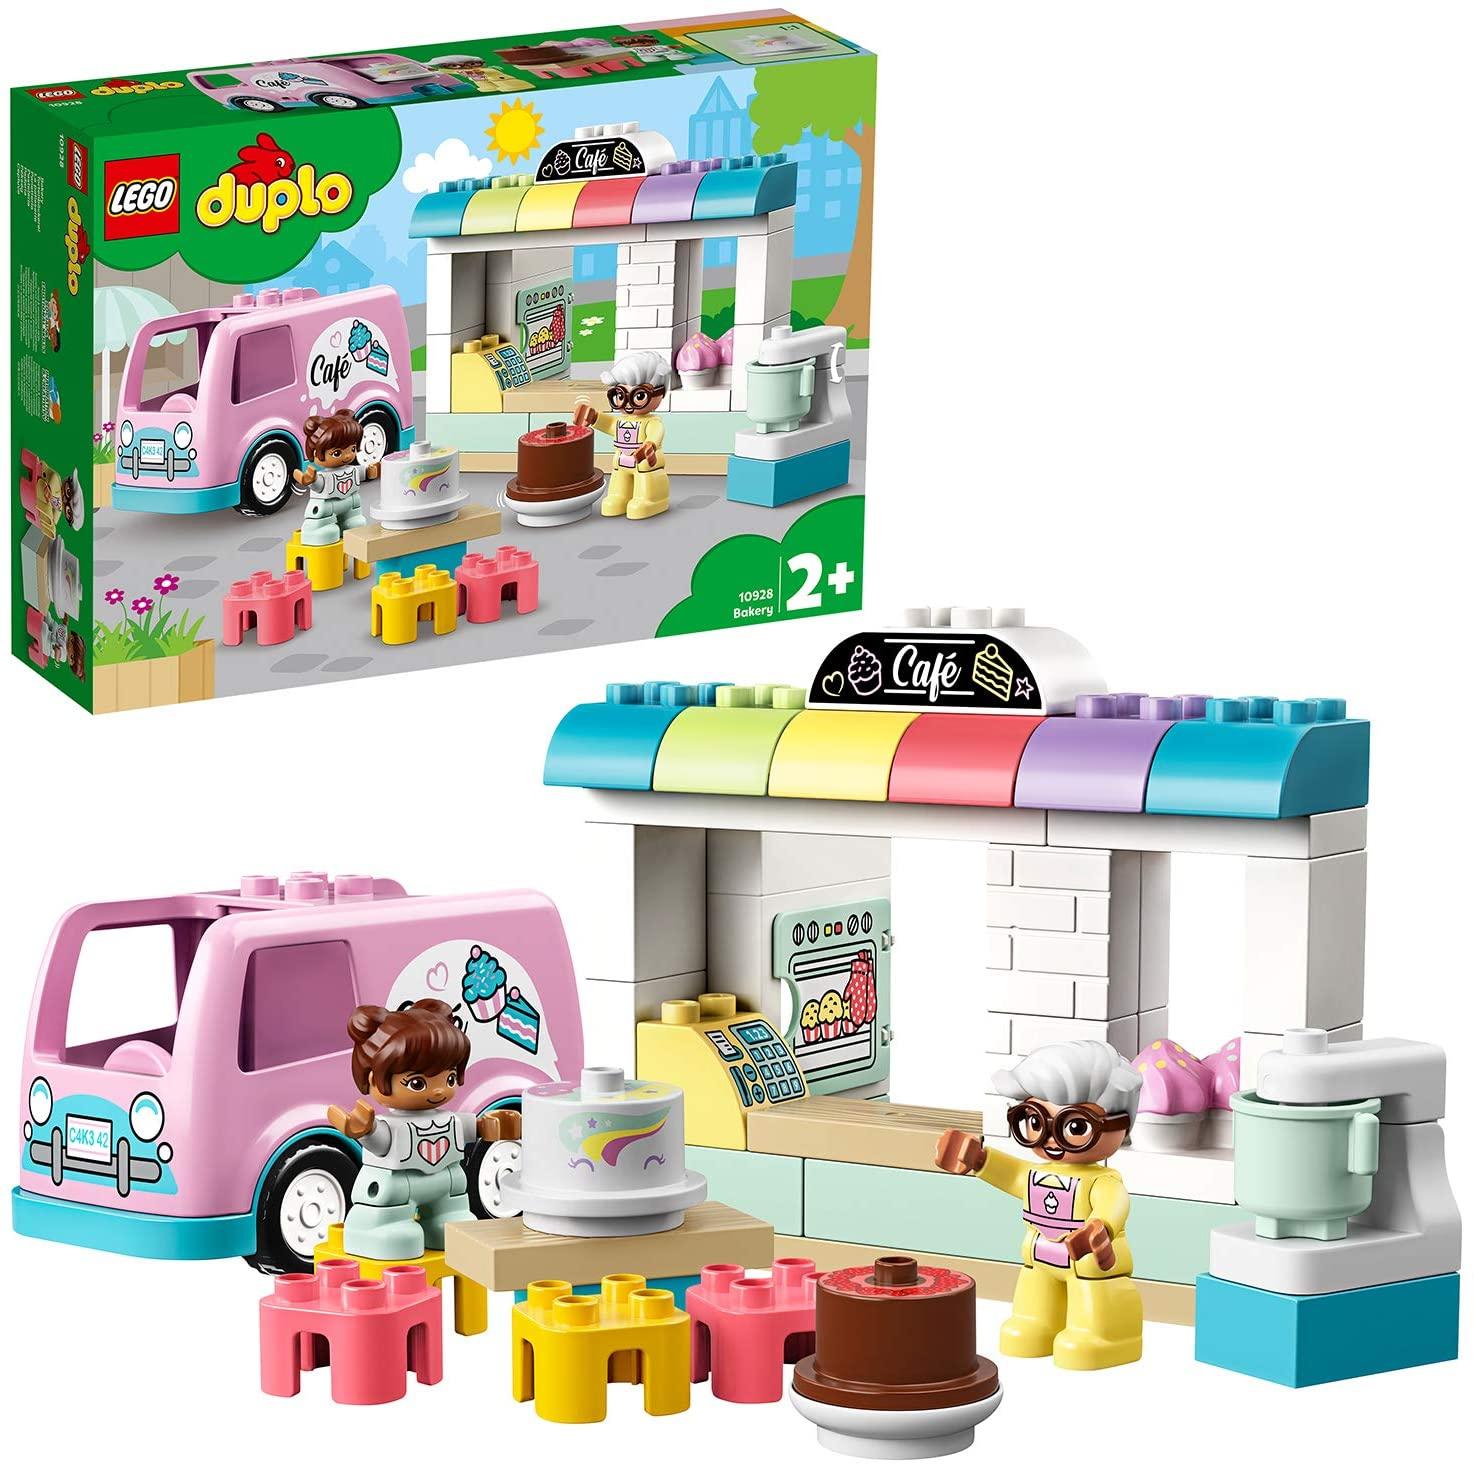 LEGO Duplo - Tortenbäckerei (10928) [Prime]